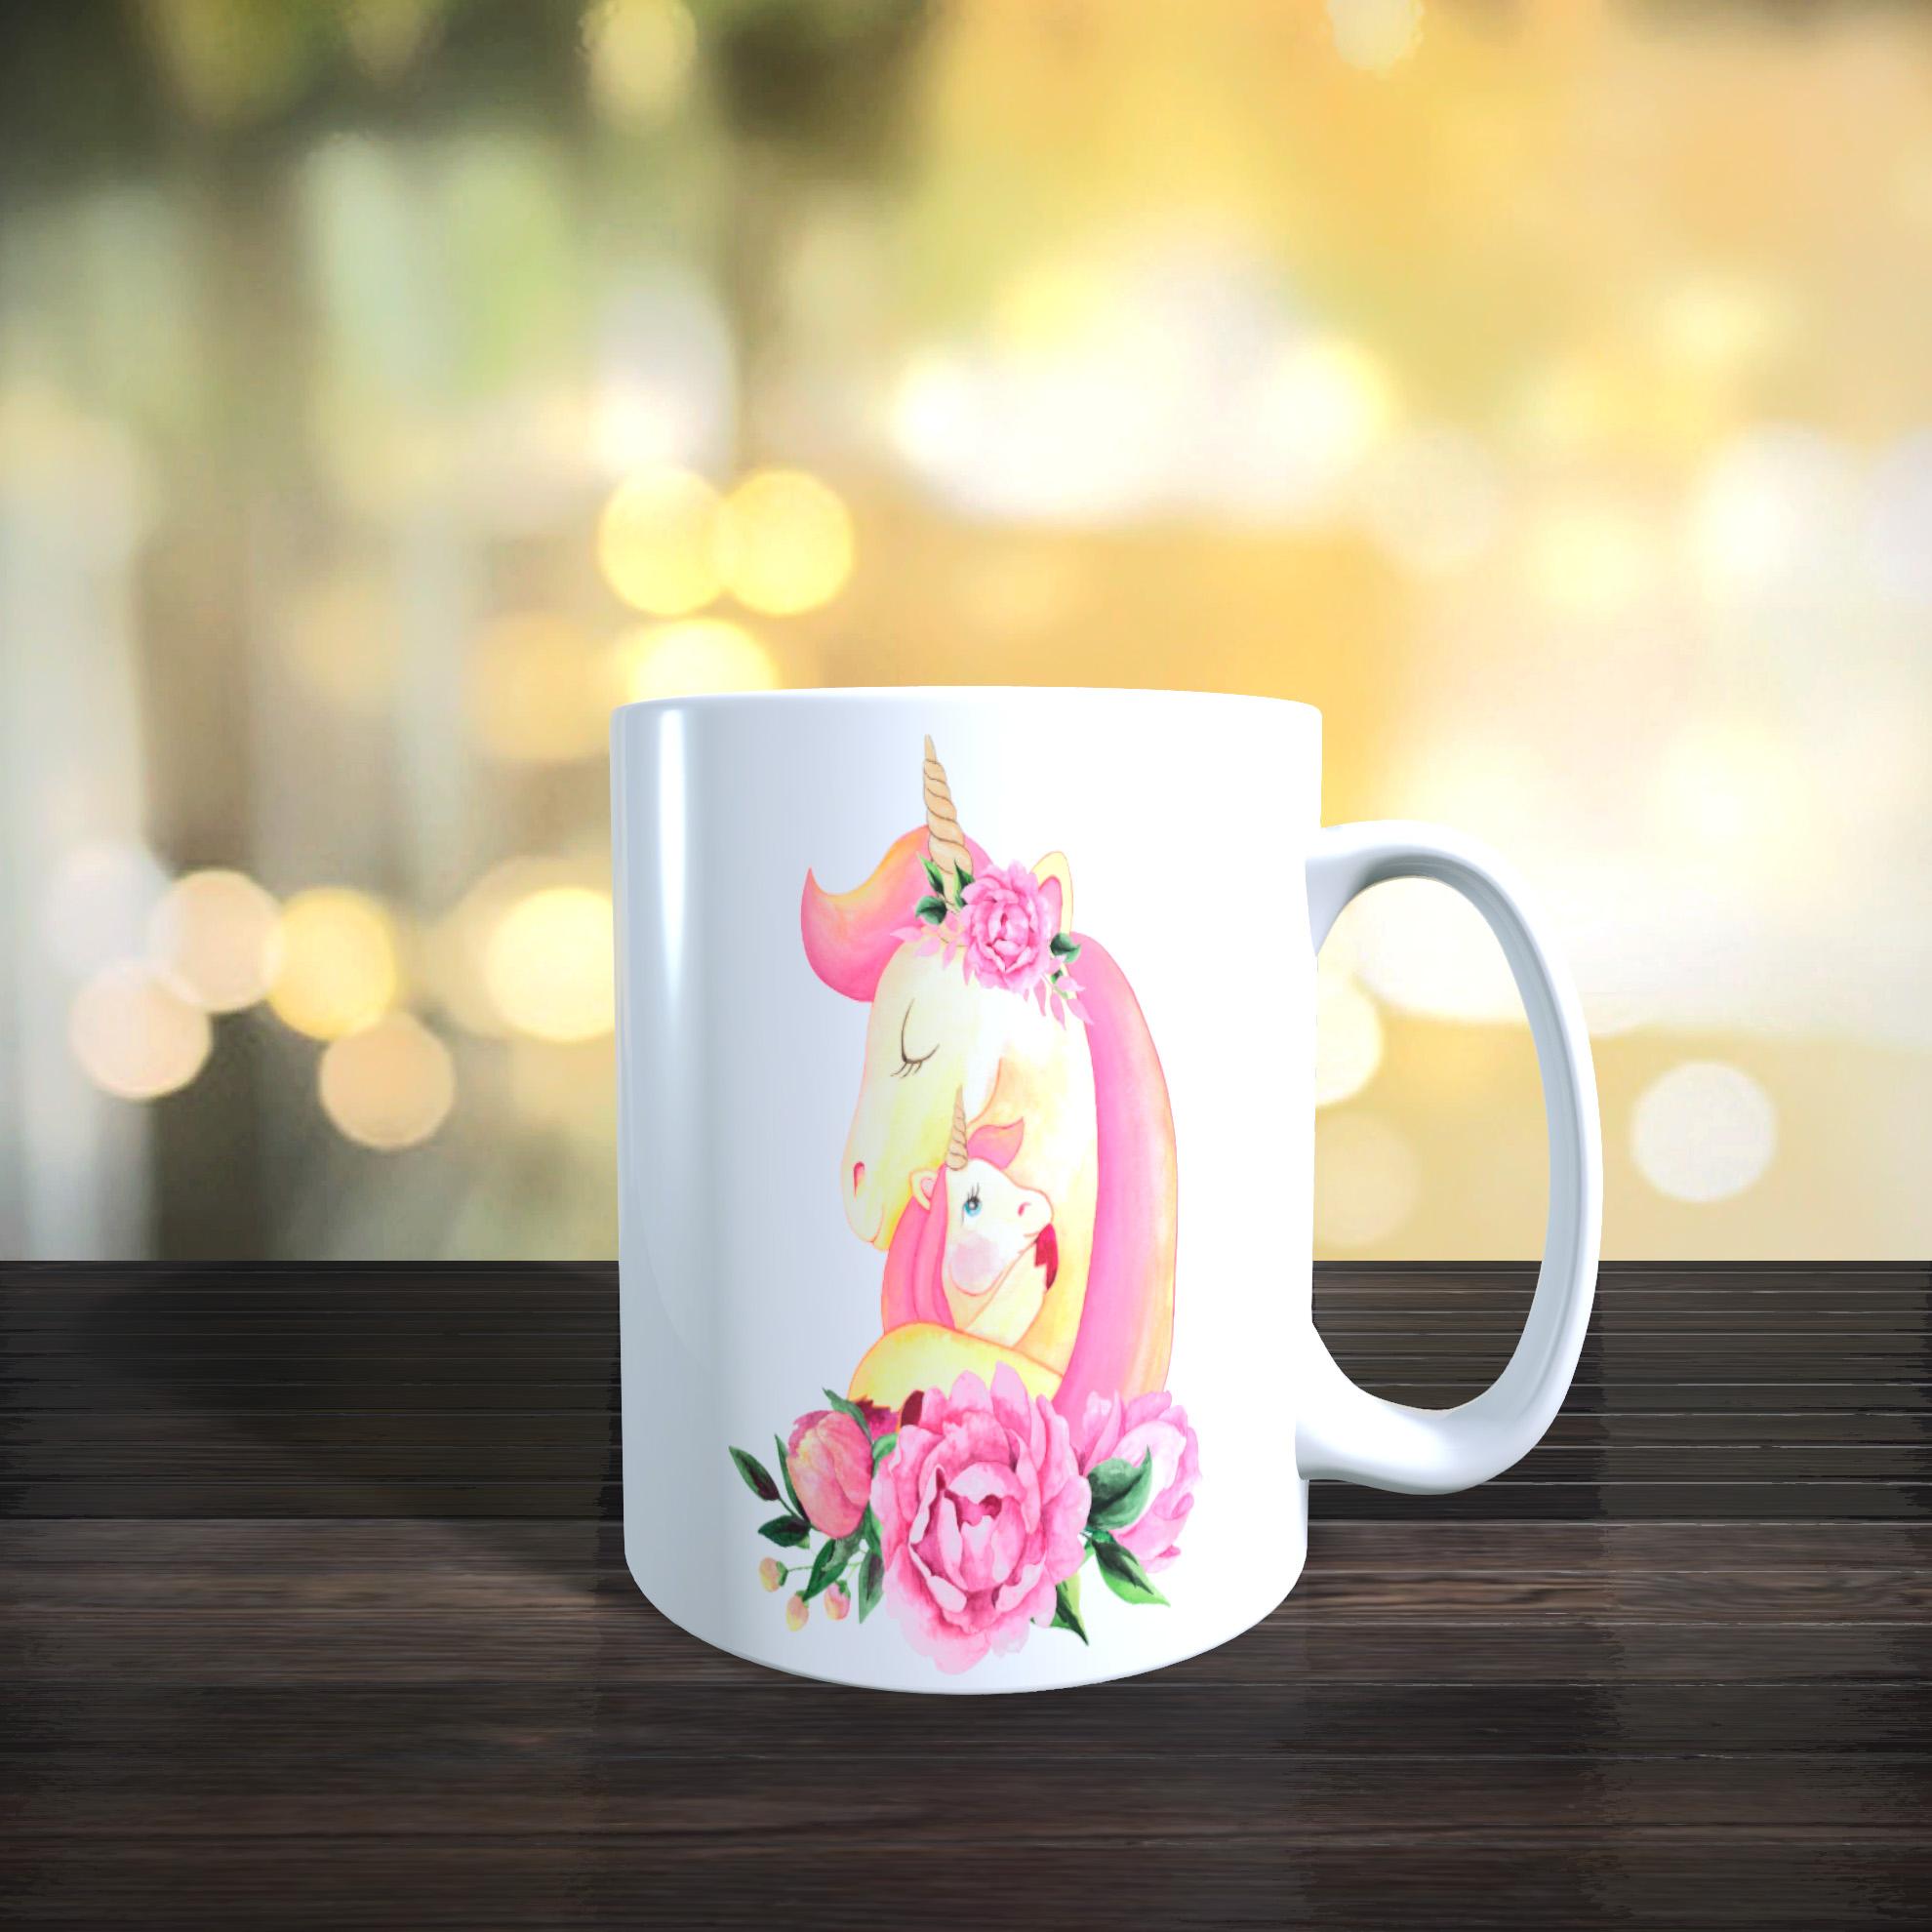 Cute Mother and Baby Unicorn 11oz Ceramic Mothers Day / Birthday Gift Mug.